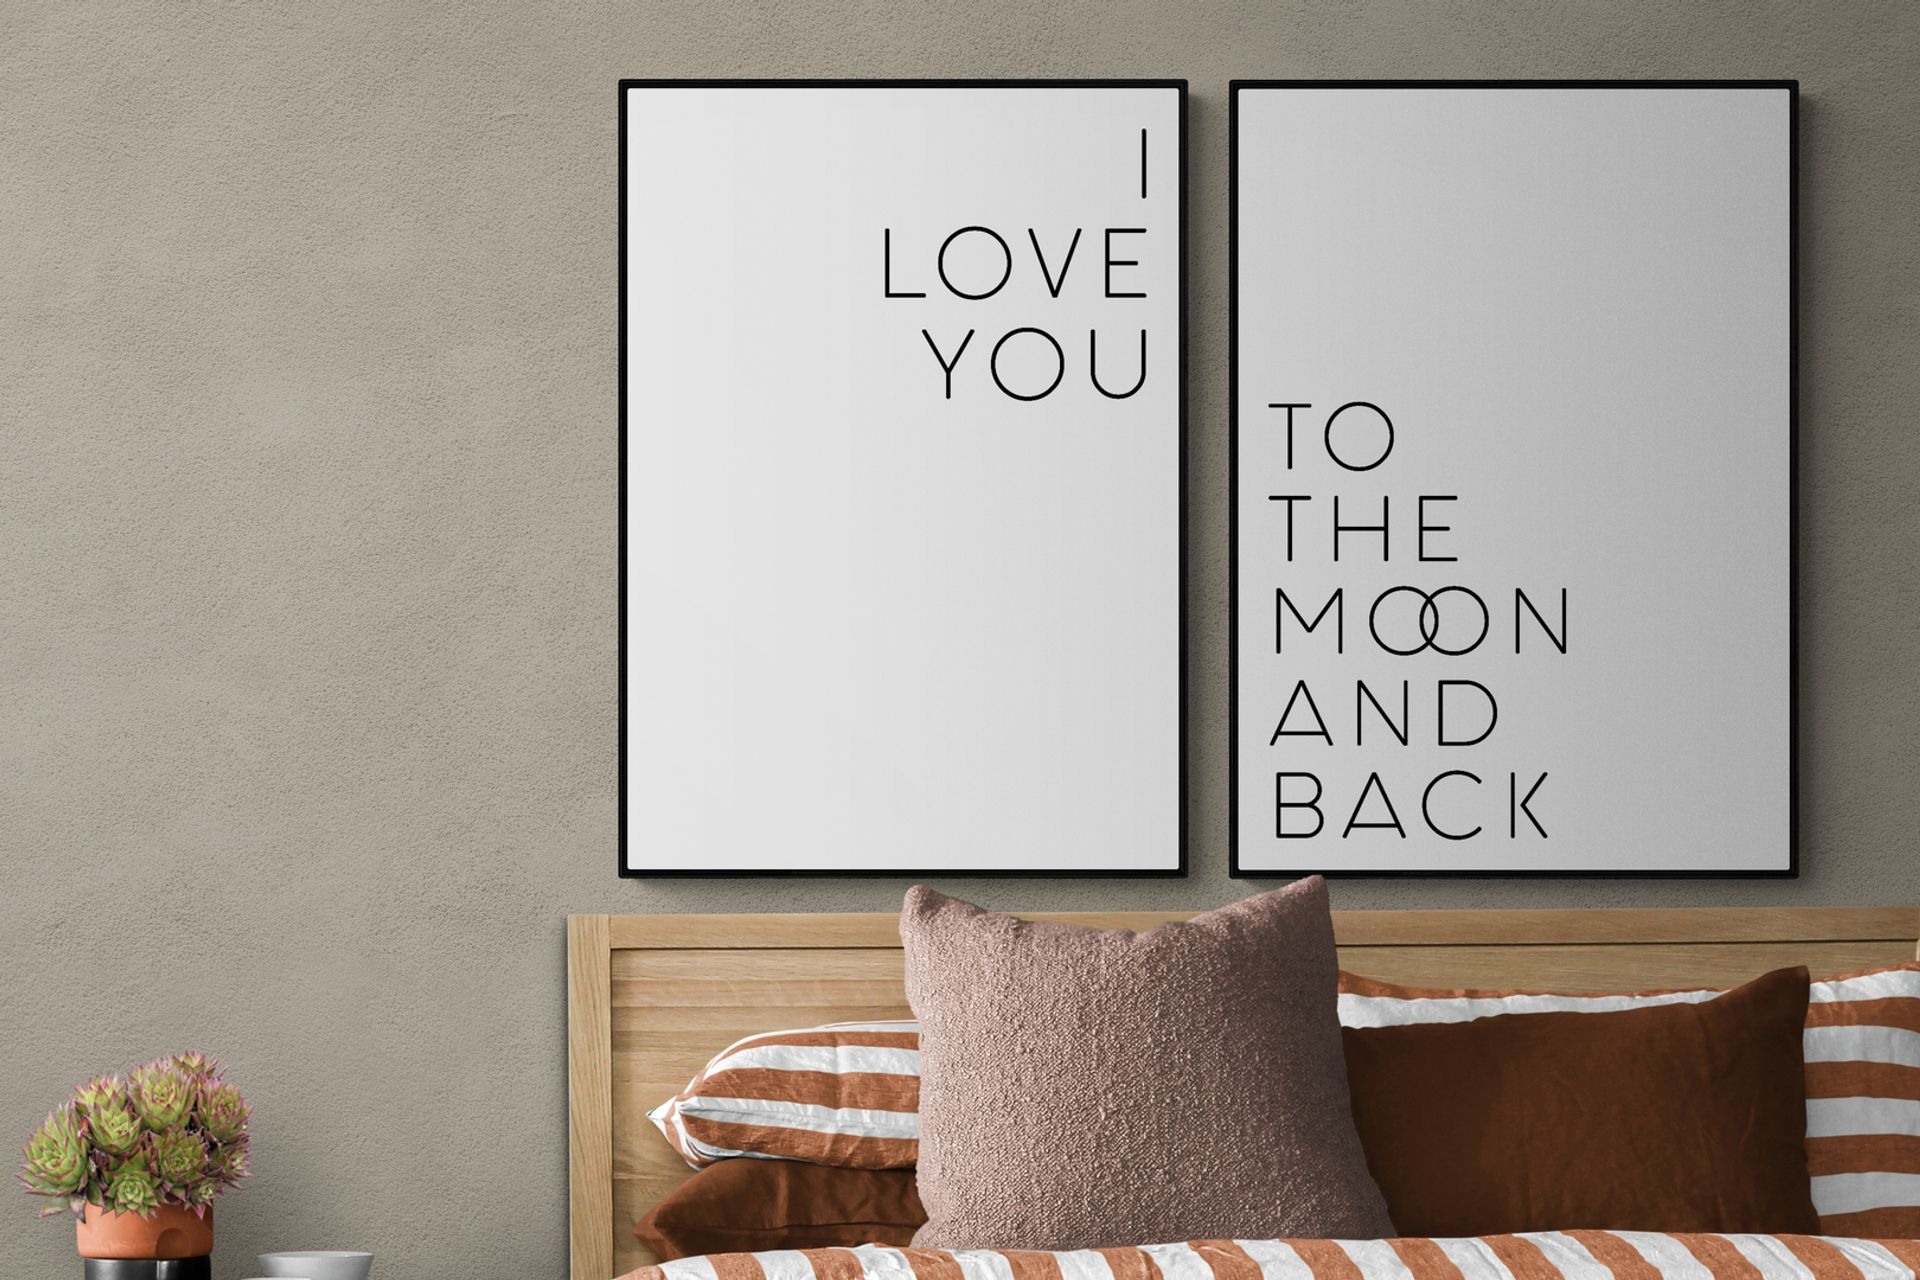 I LOVE YOU MOON THE BACK  SİYAH ÇERÇEVE TABLO SETİ 33X48